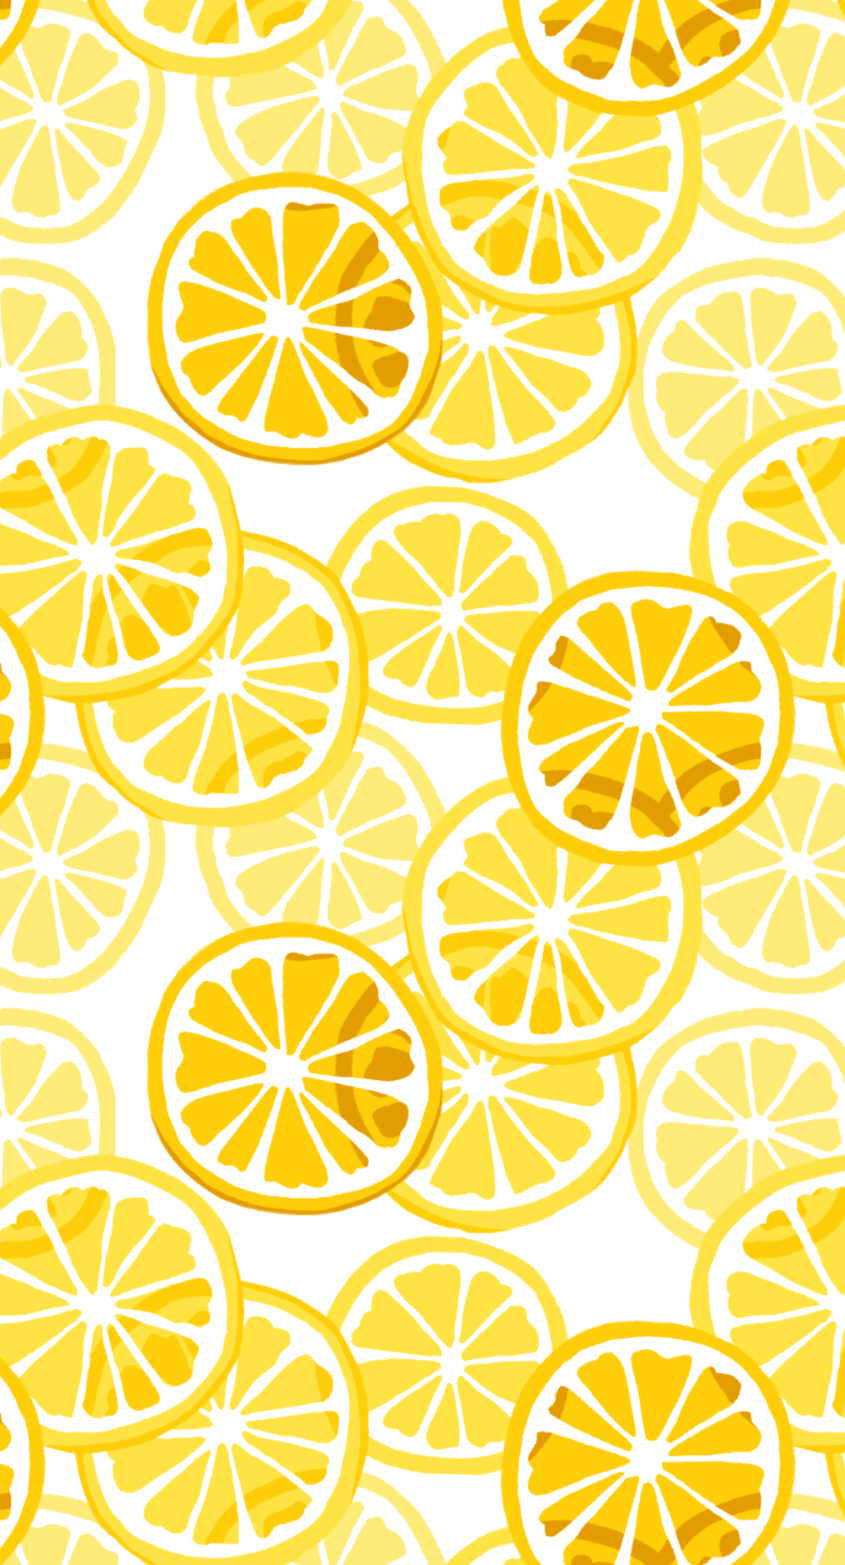 Repeat Citrus Pattern: Lemons